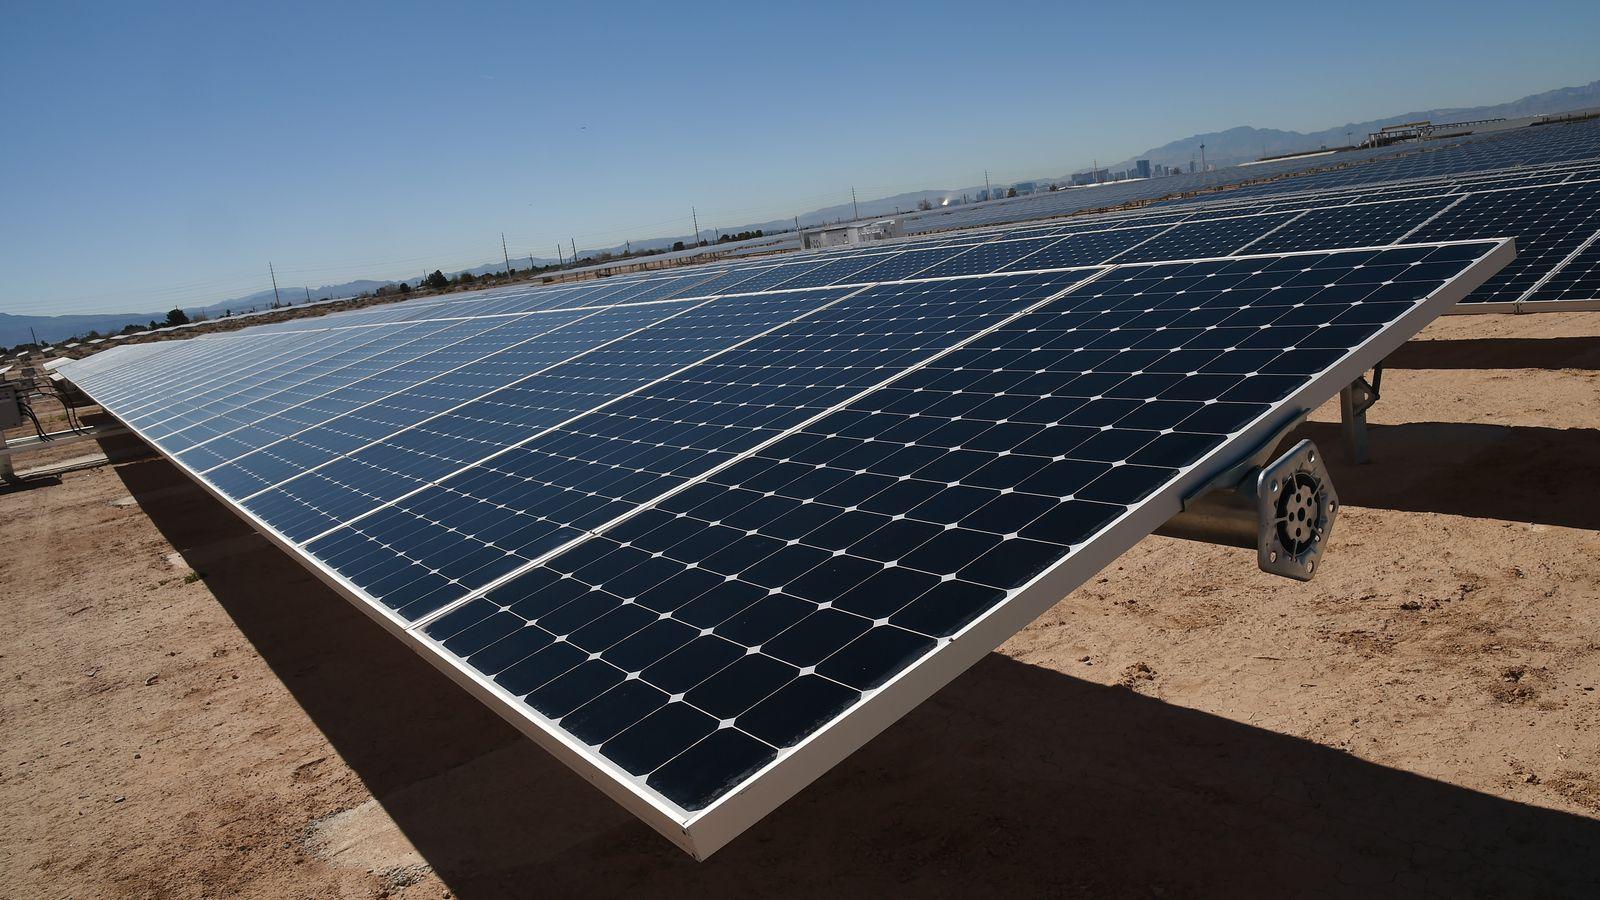 Tesla And Panasonic To Build Solar Panels Together